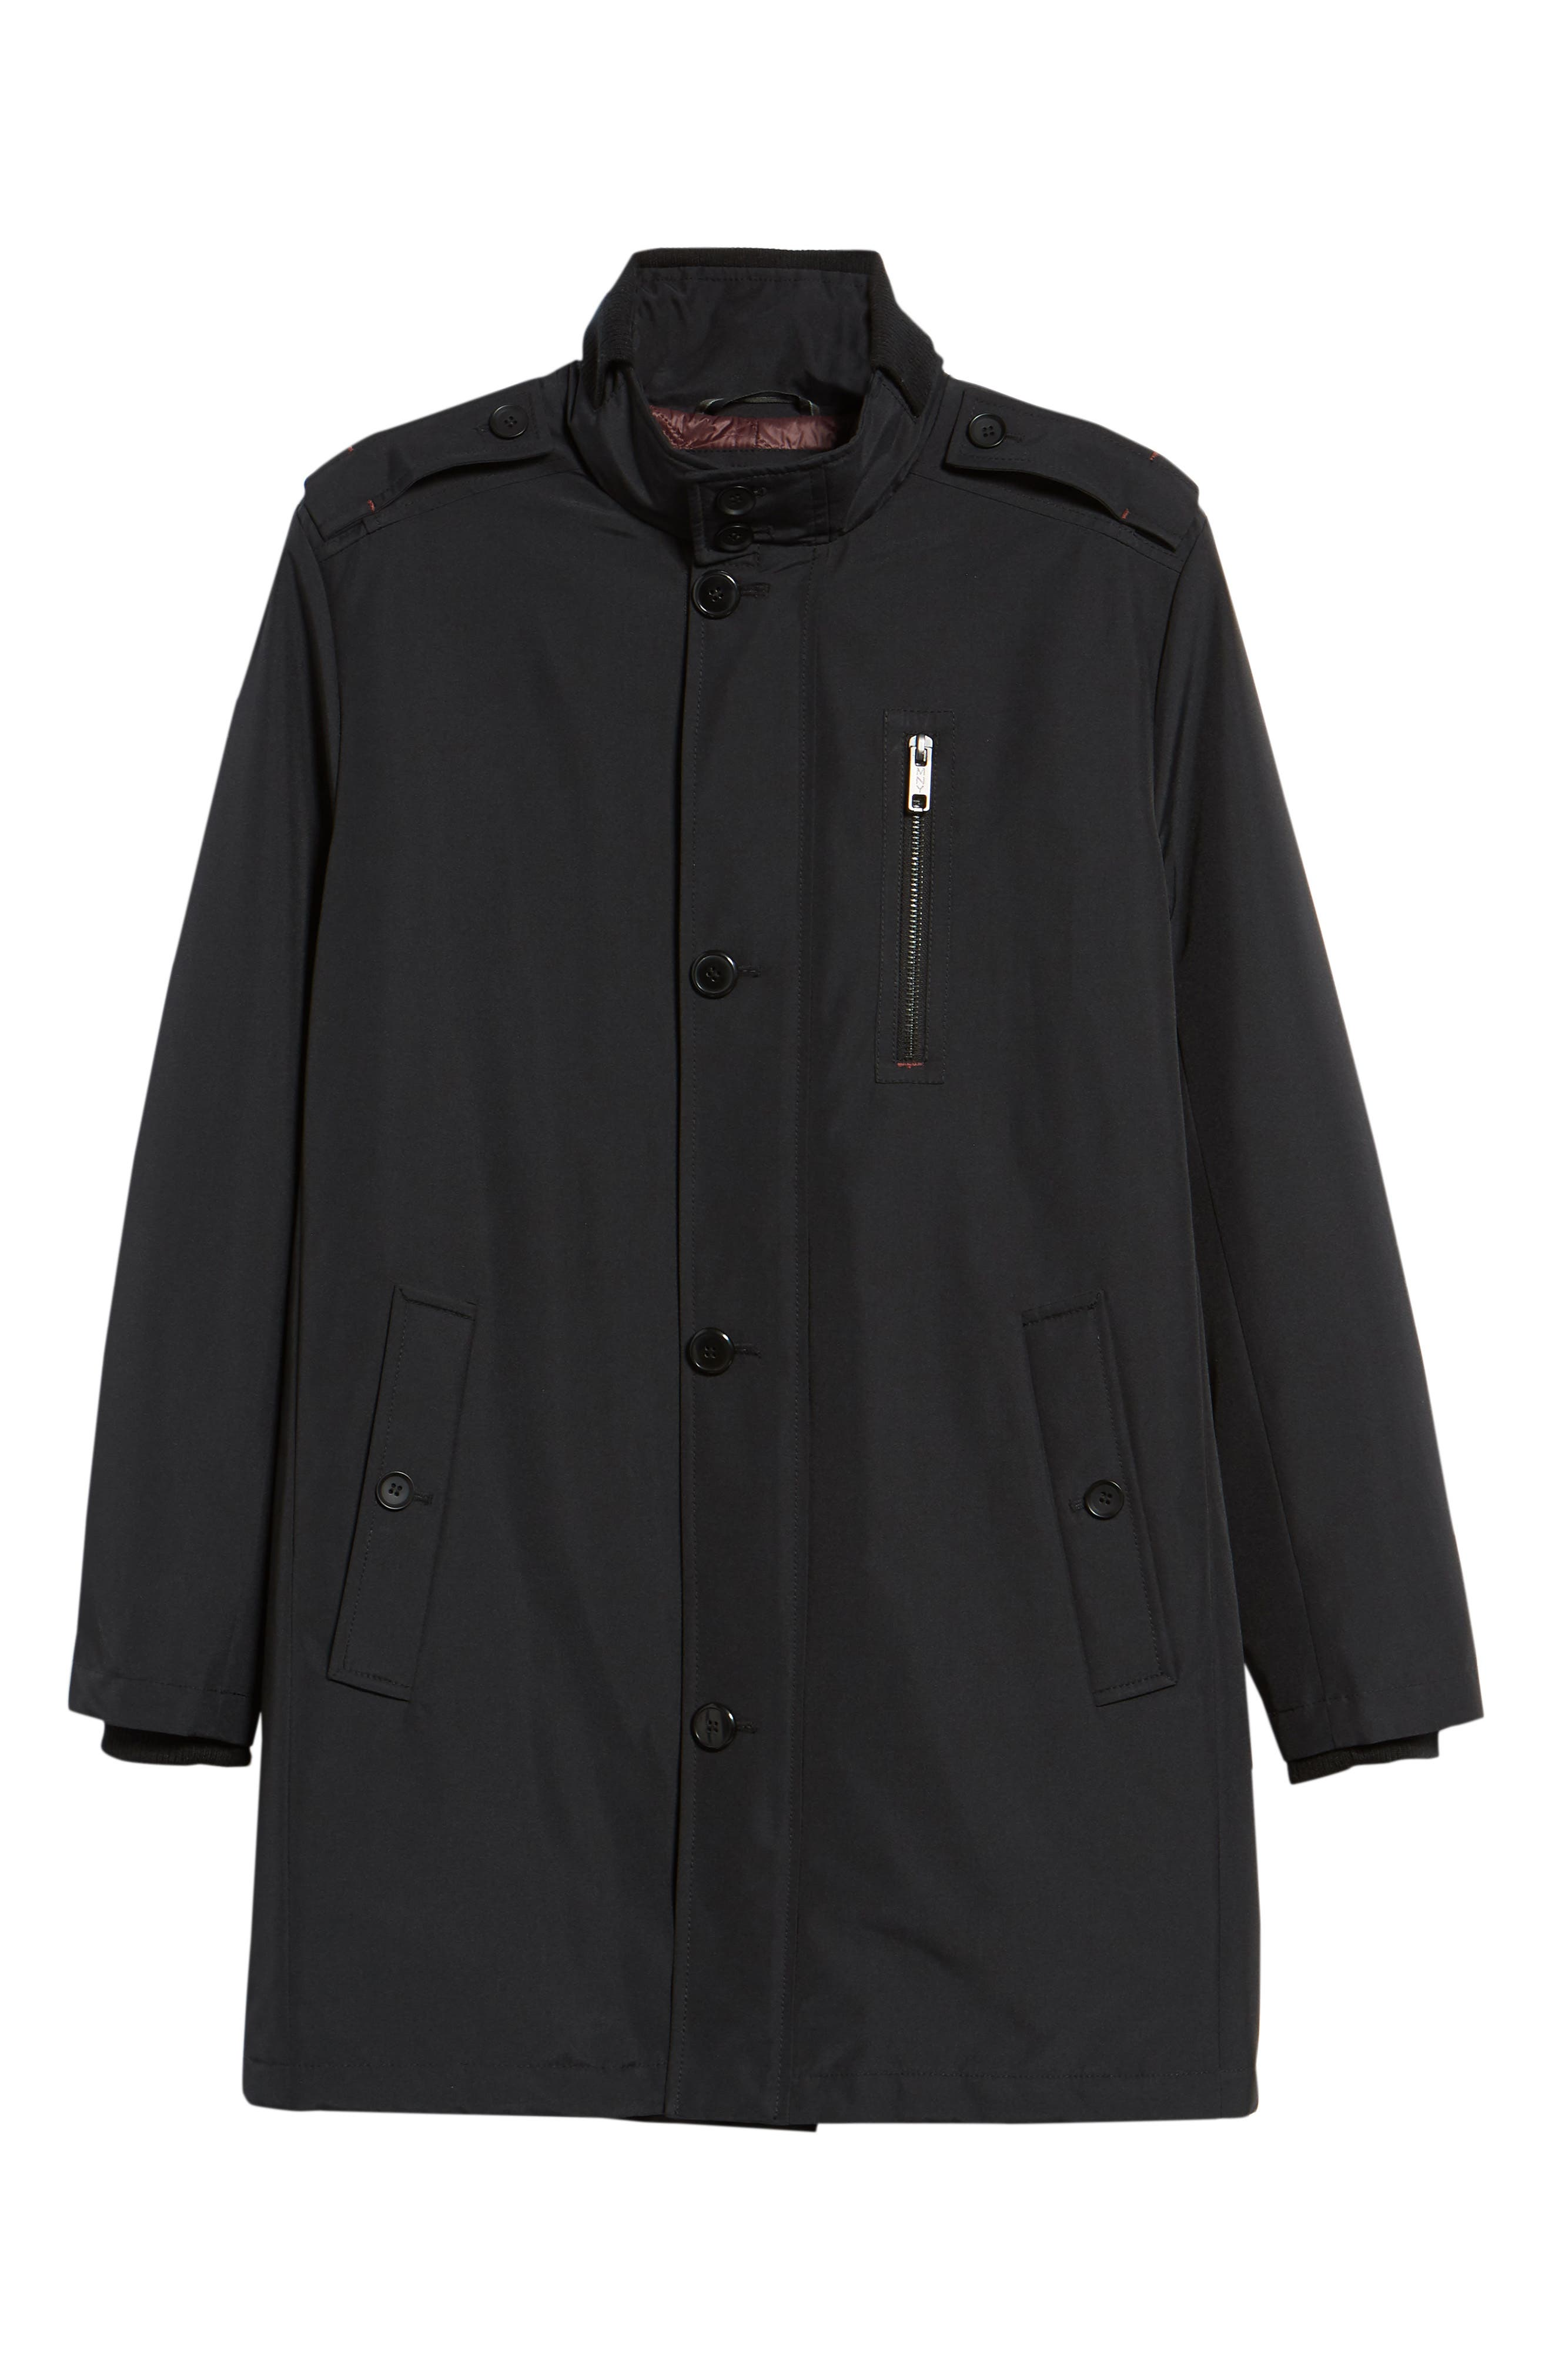 MARC NEW YORK, Cullen Oxford Car Coat, Alternate thumbnail 5, color, BLACK